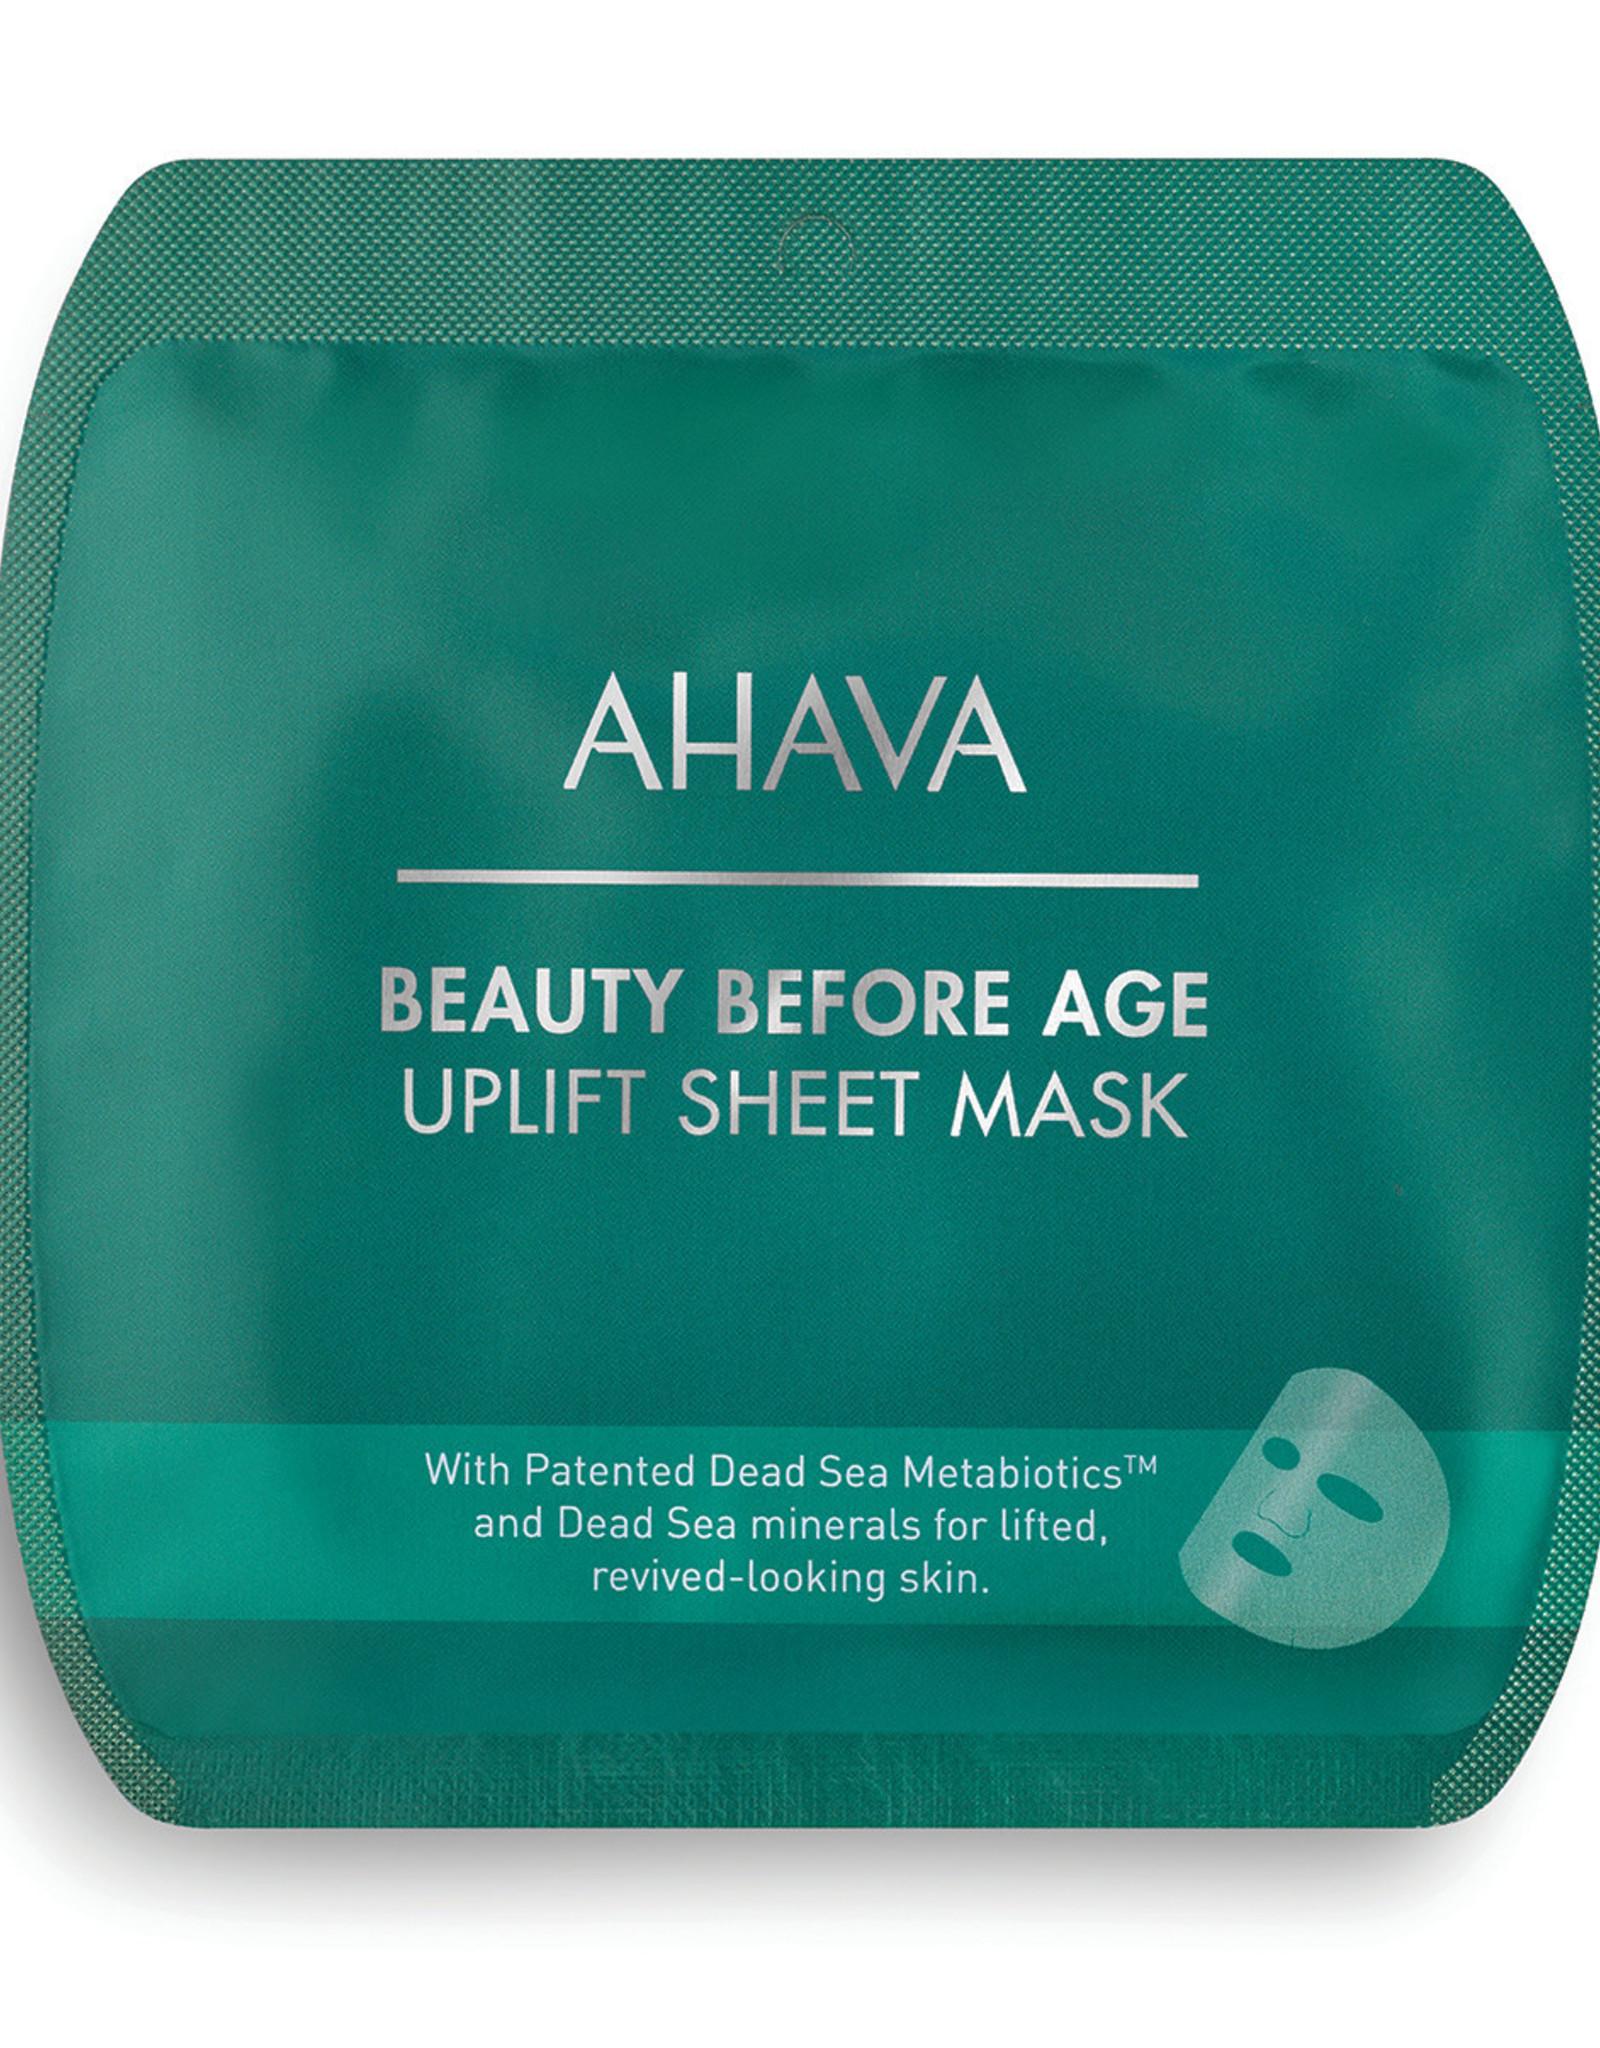 AHAVA Uplift sheet mask